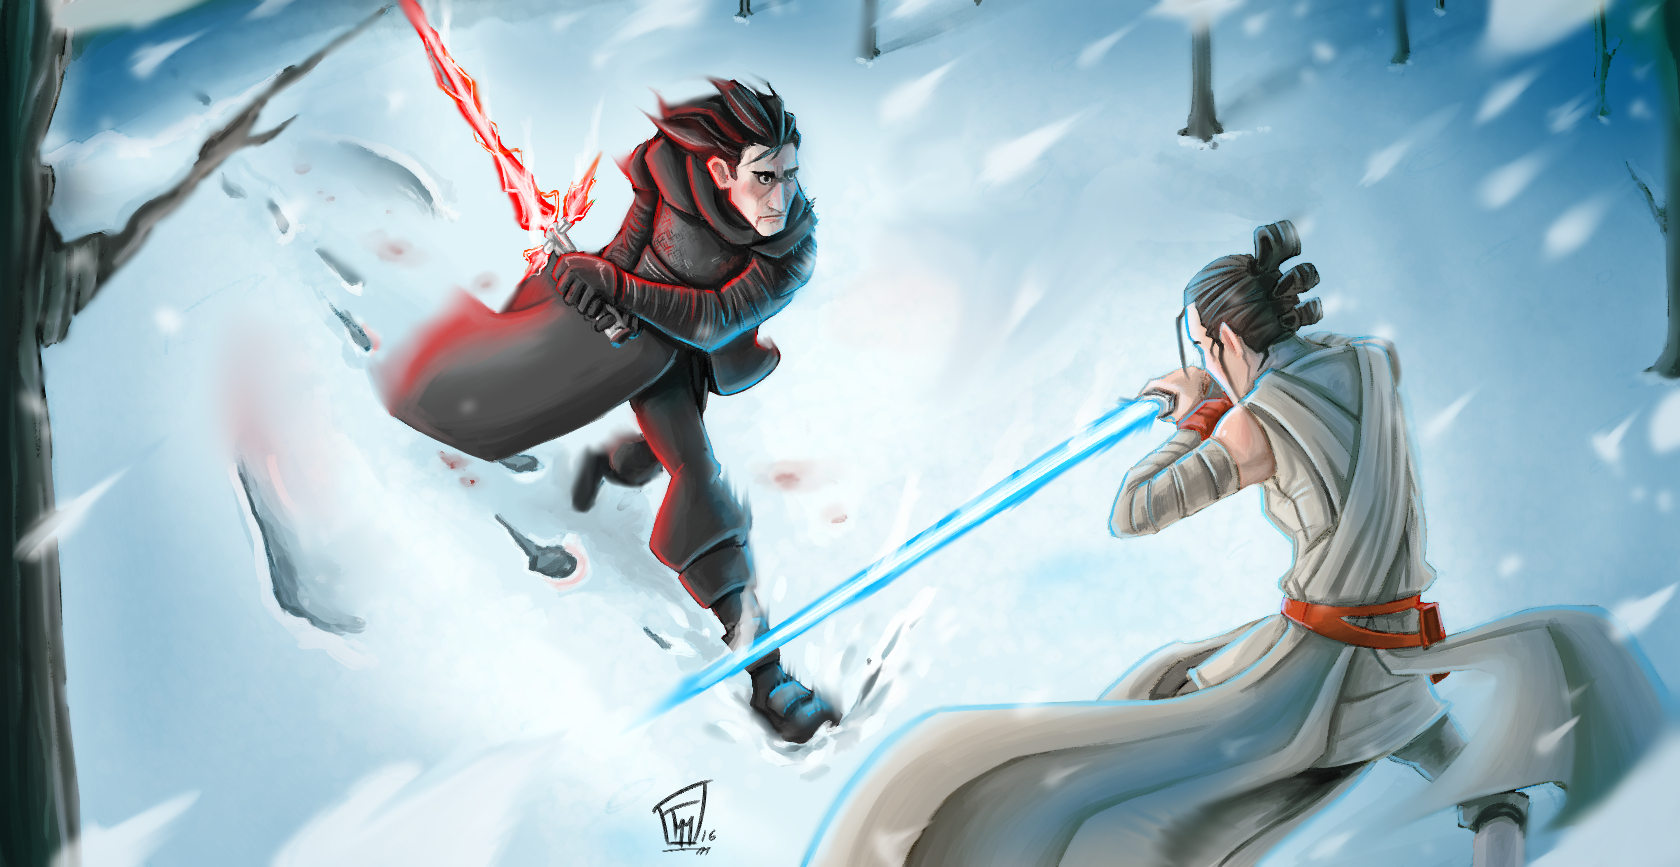 Kylo Ren vs Rey by Kakiusko on Newgrounds 1680x867